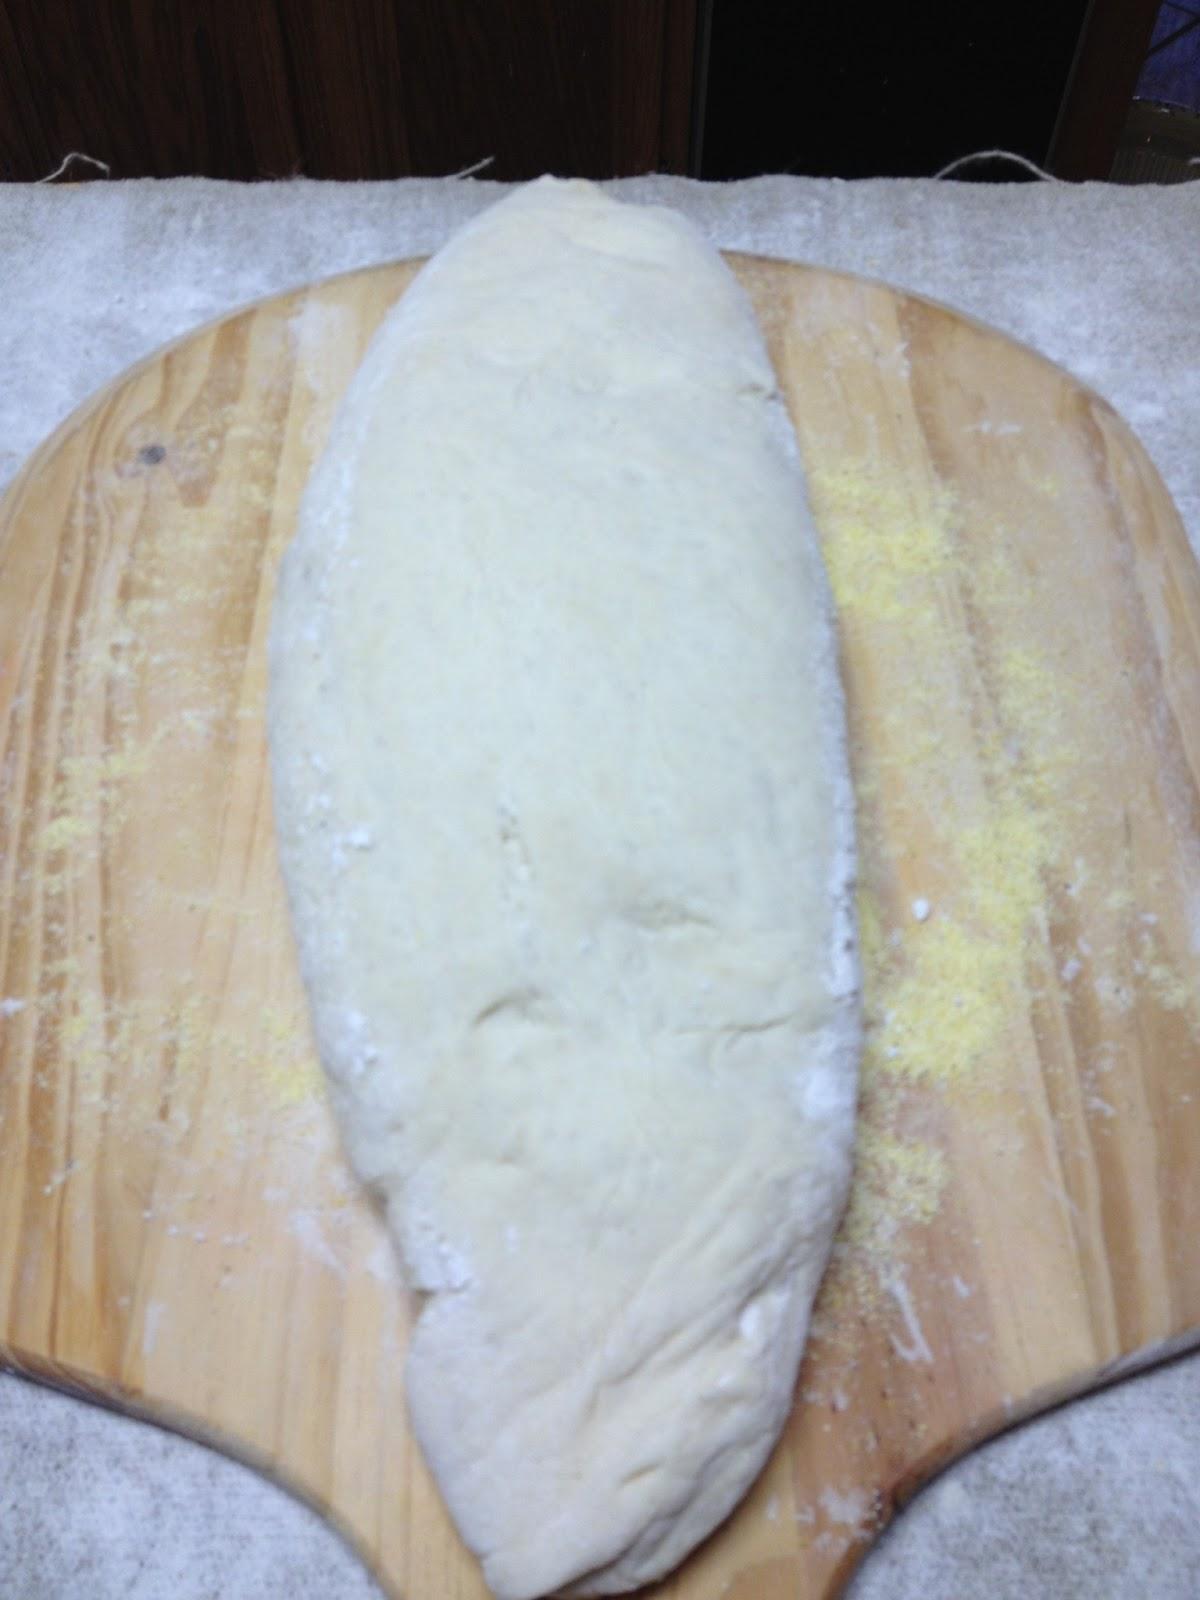 Tracy Cooks in Austin: Crusty, Rustic, Italian Bread